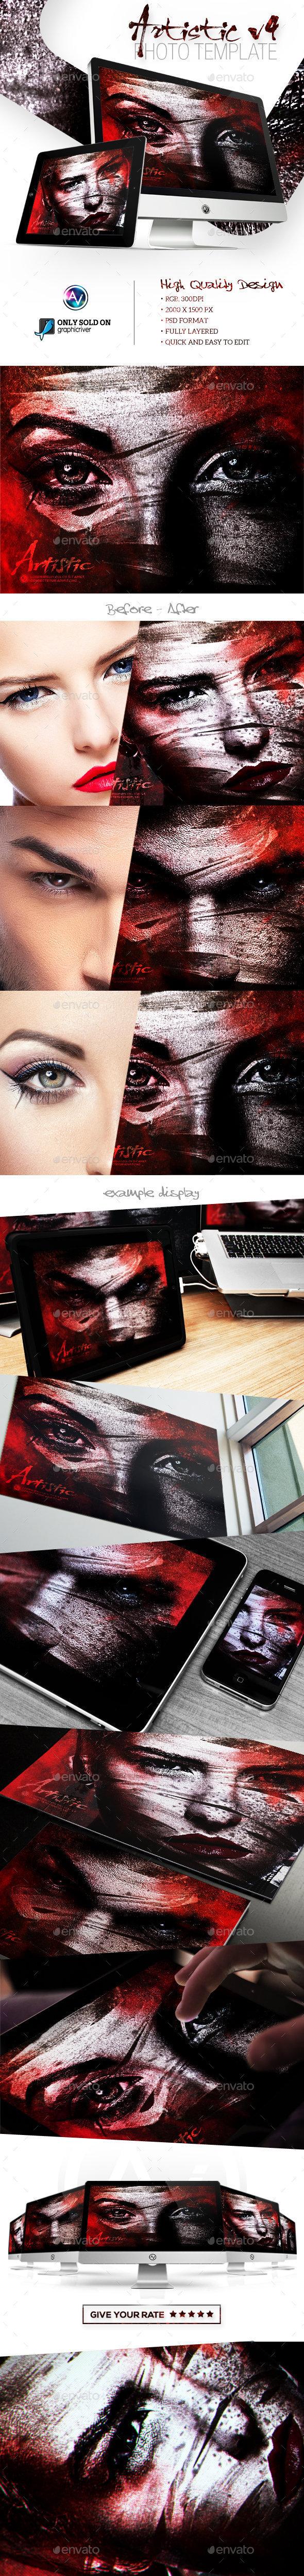 Artistic Photo Template V4 - Artistic Photo Templates